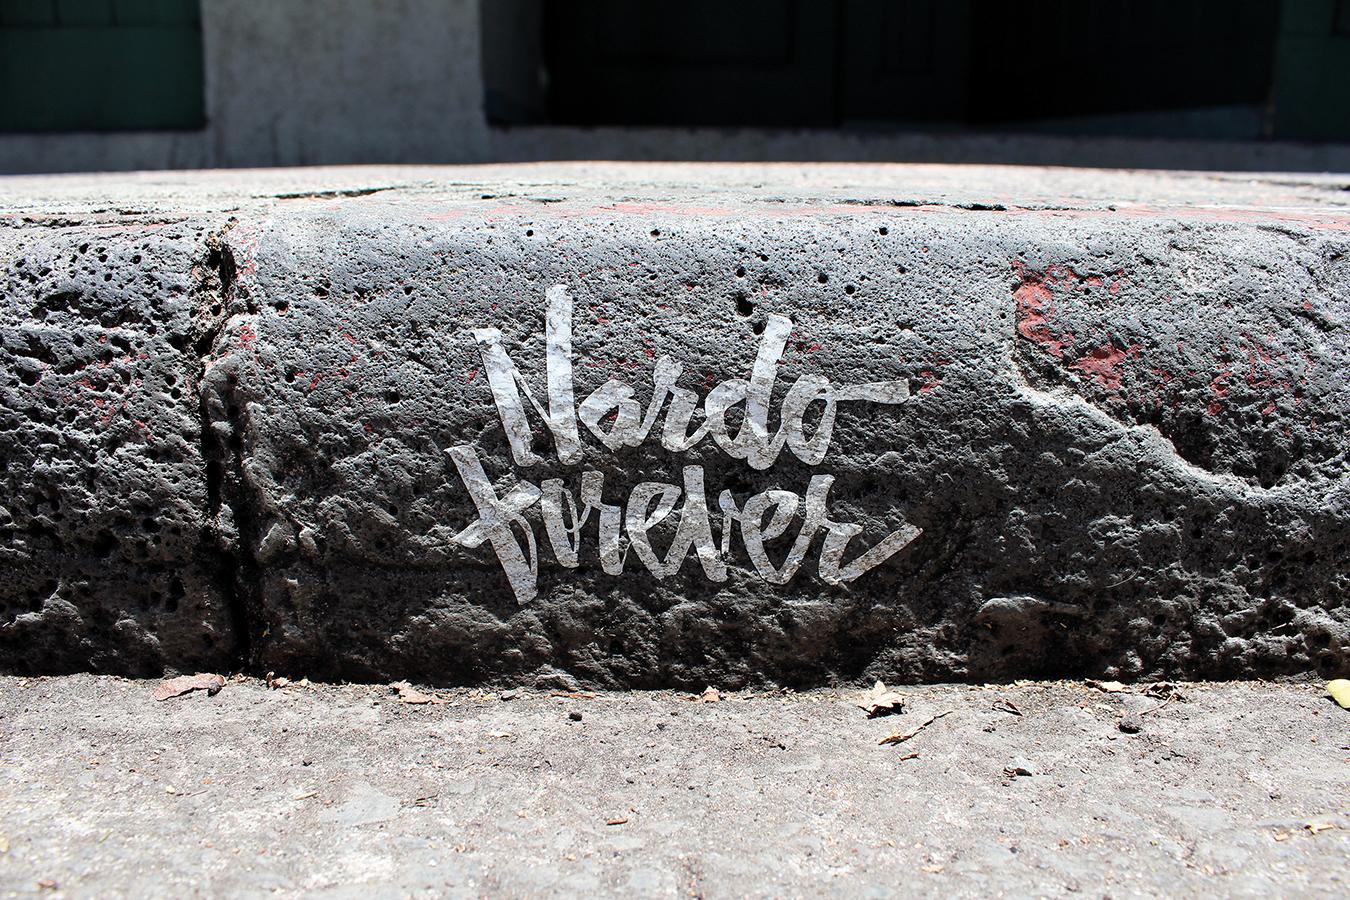 Nardo Forever Curb1.jpg